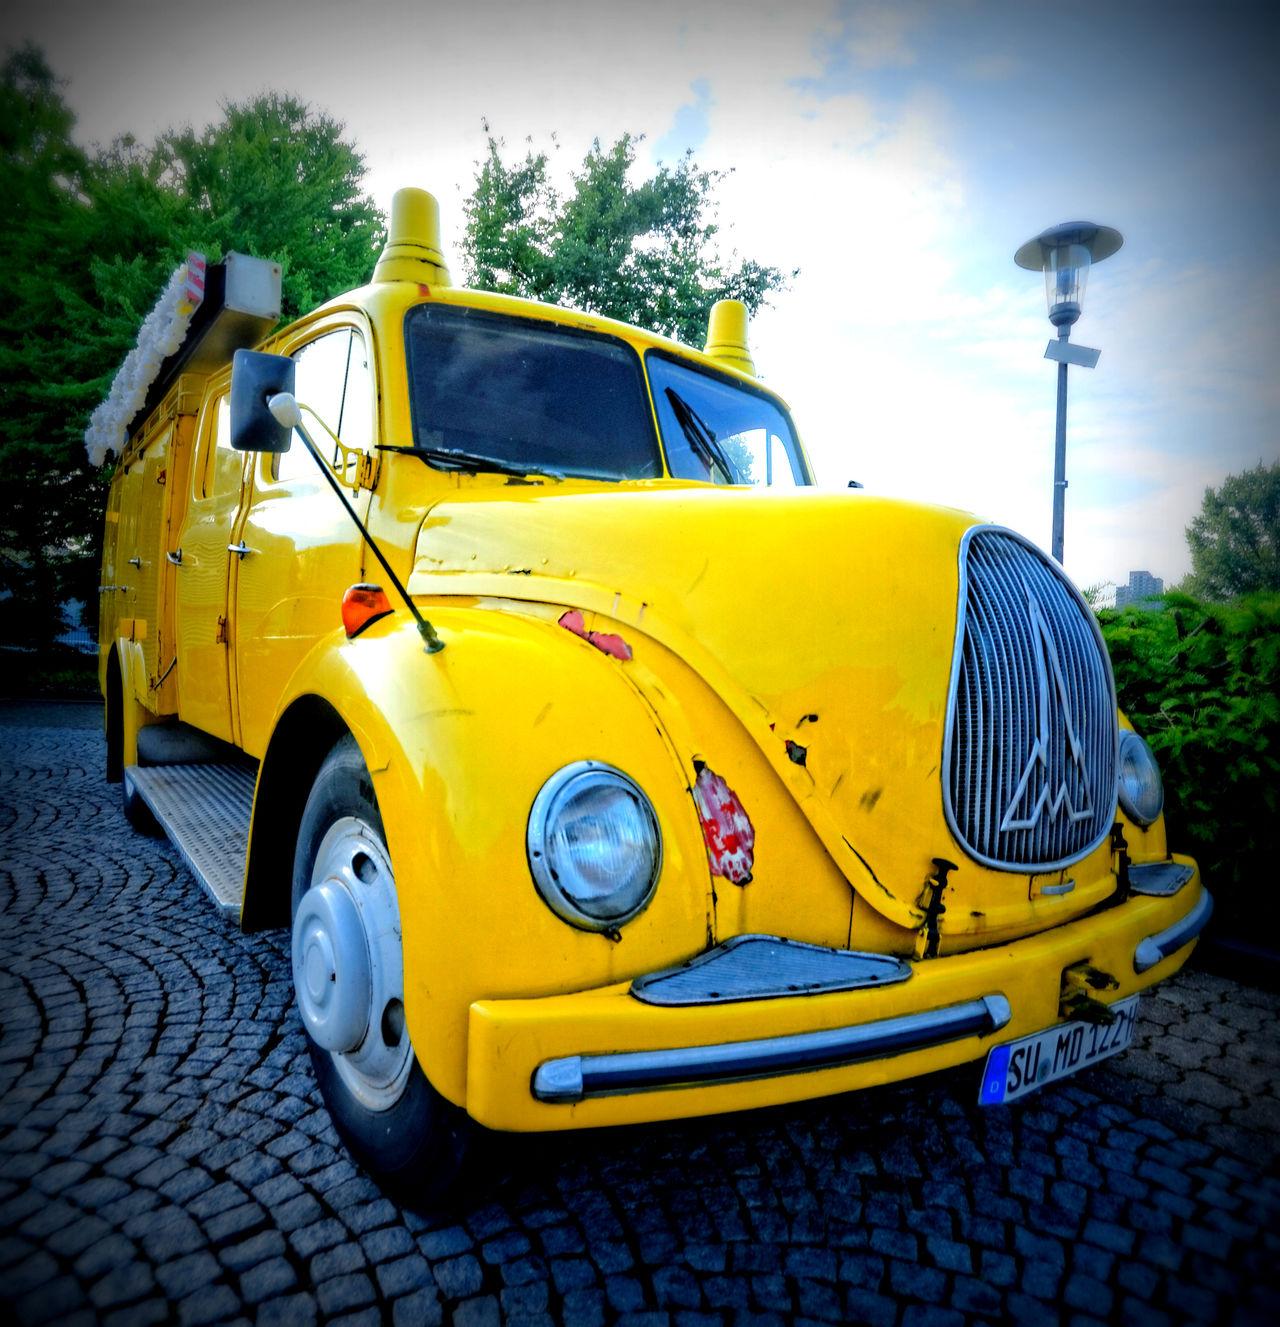 Car Magirus Deutz Old Car Old-fashioned Transportation Vehicle